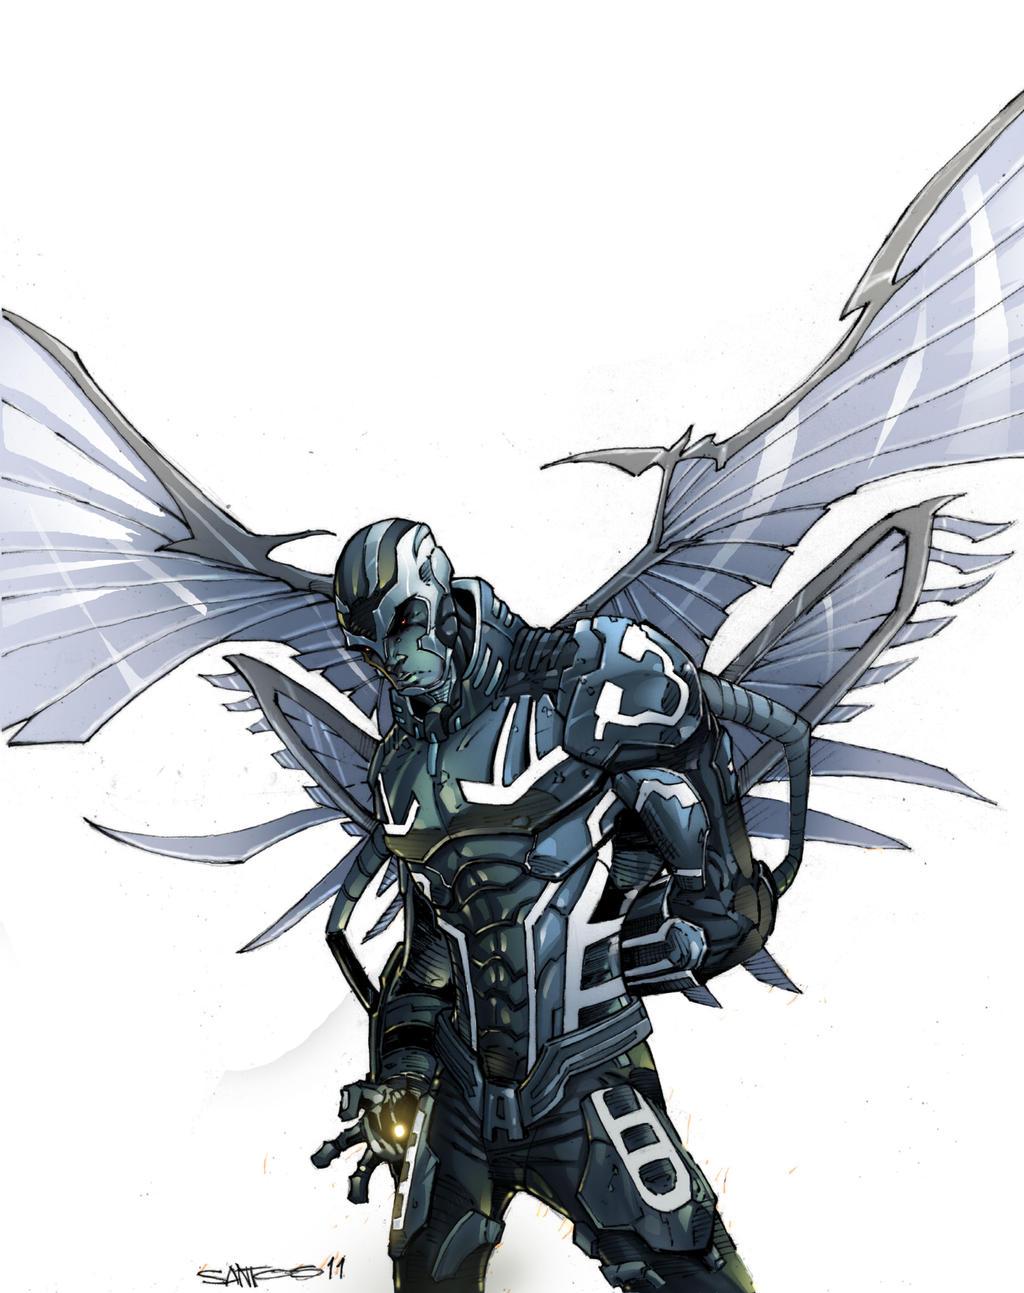 Popular Wallpaper Marvel Archangel - apocalypse_seed_archangel_no_bg_by_walkonwater77-d4h1w7a  2018_113318.jpg